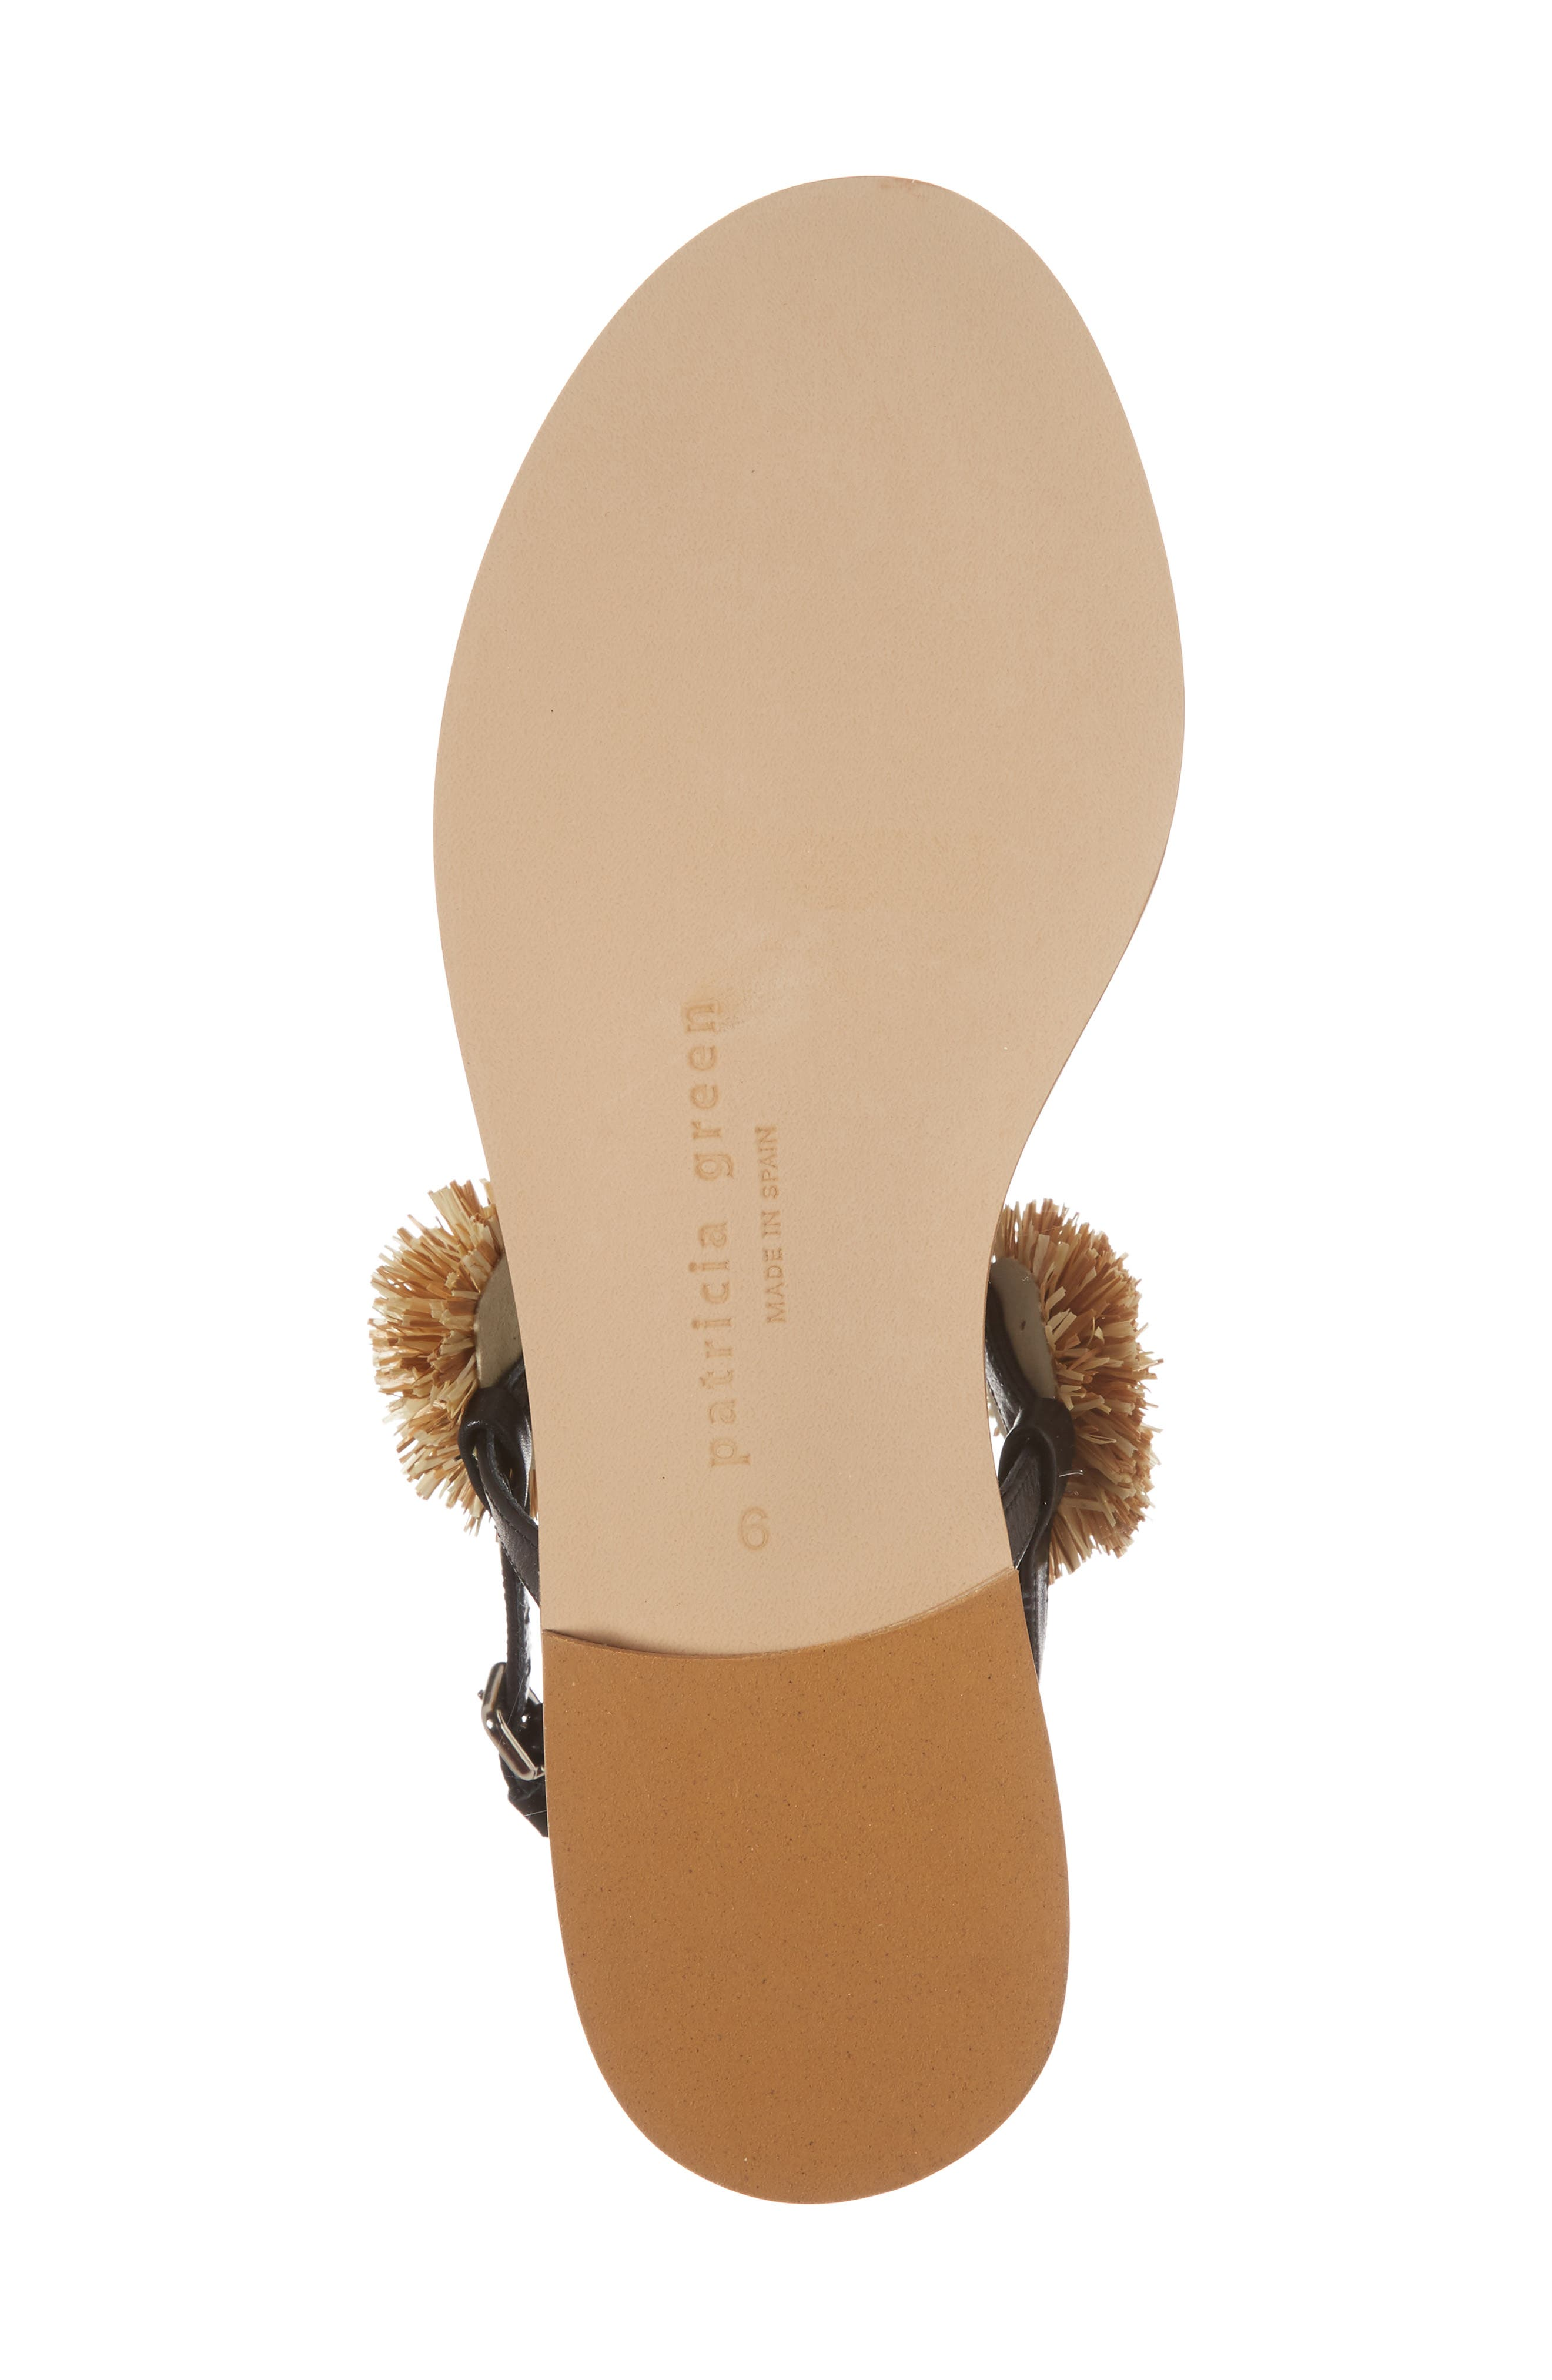 Pompom Thong Sandal,                             Alternate thumbnail 6, color,                             Black Leather